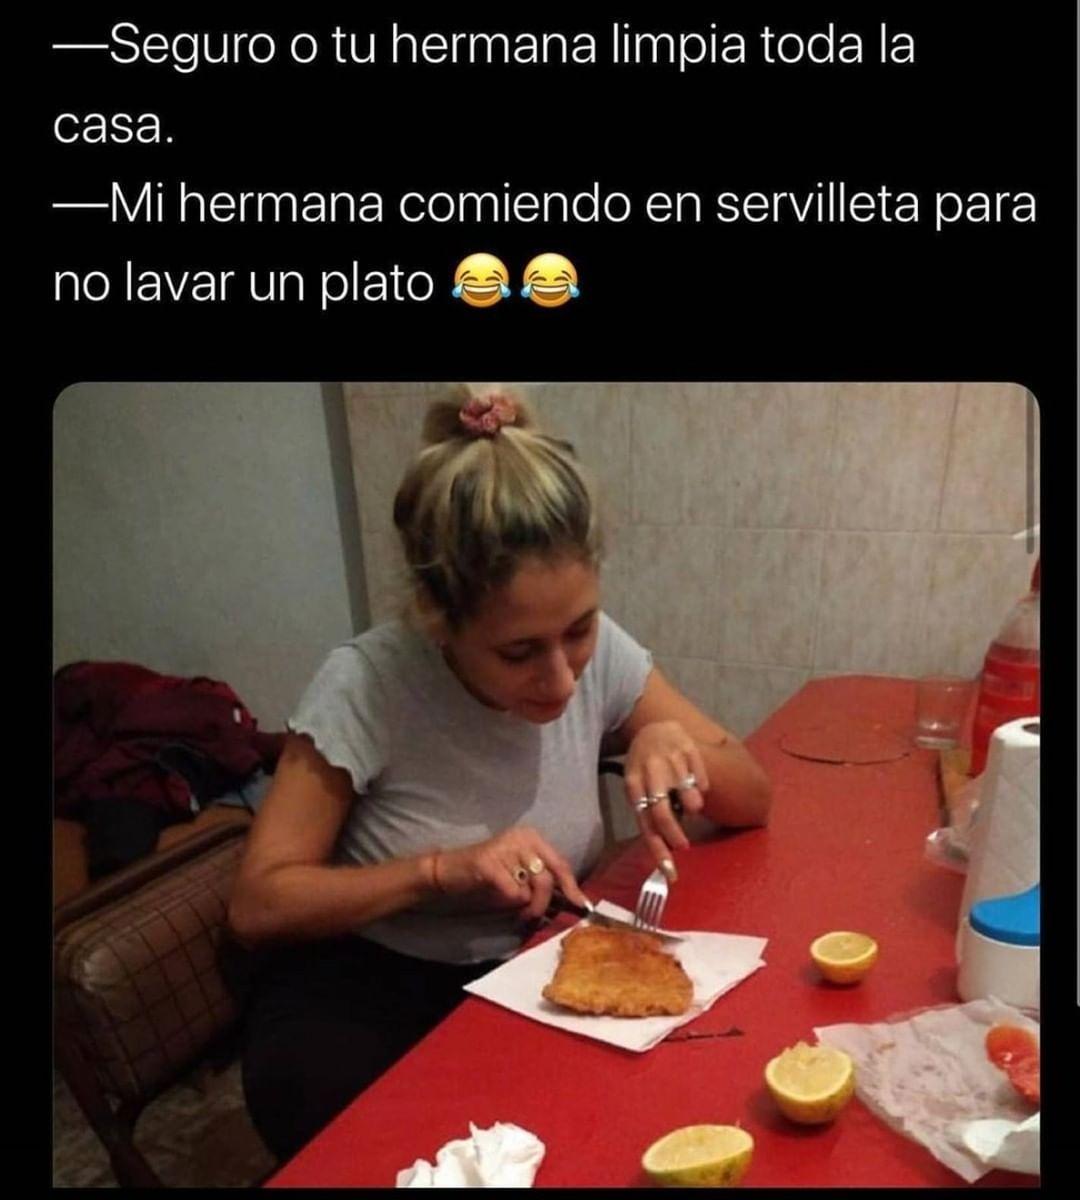 Seguro o tu hermana limpia toda la casa.  Mi hermana comiendo en servilleta para no lavar un plato.